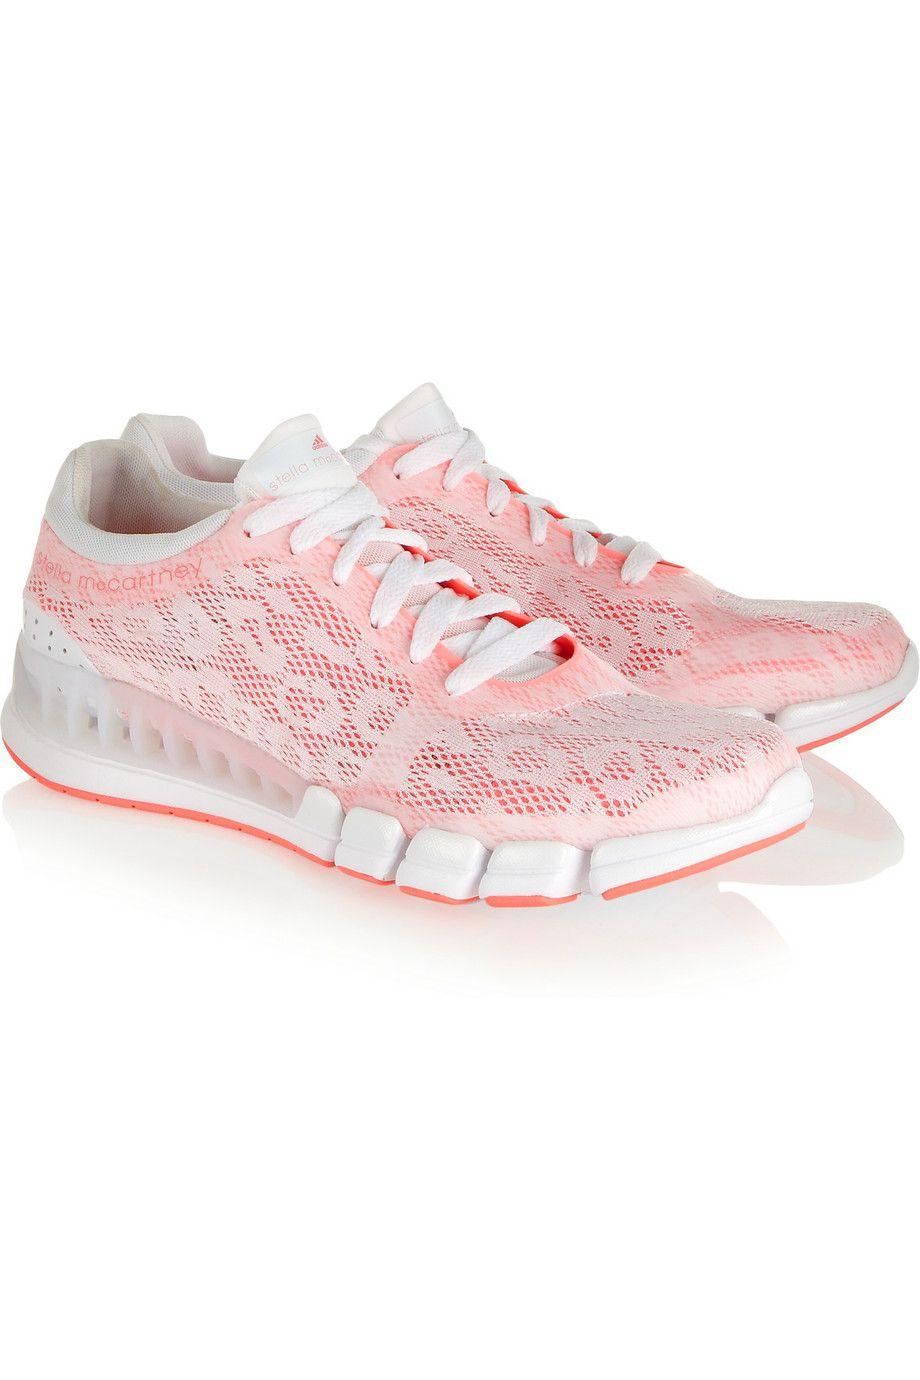 finest selection ce053 03d64 Adidas by Stella McCartney - Kea Clima sneakers.